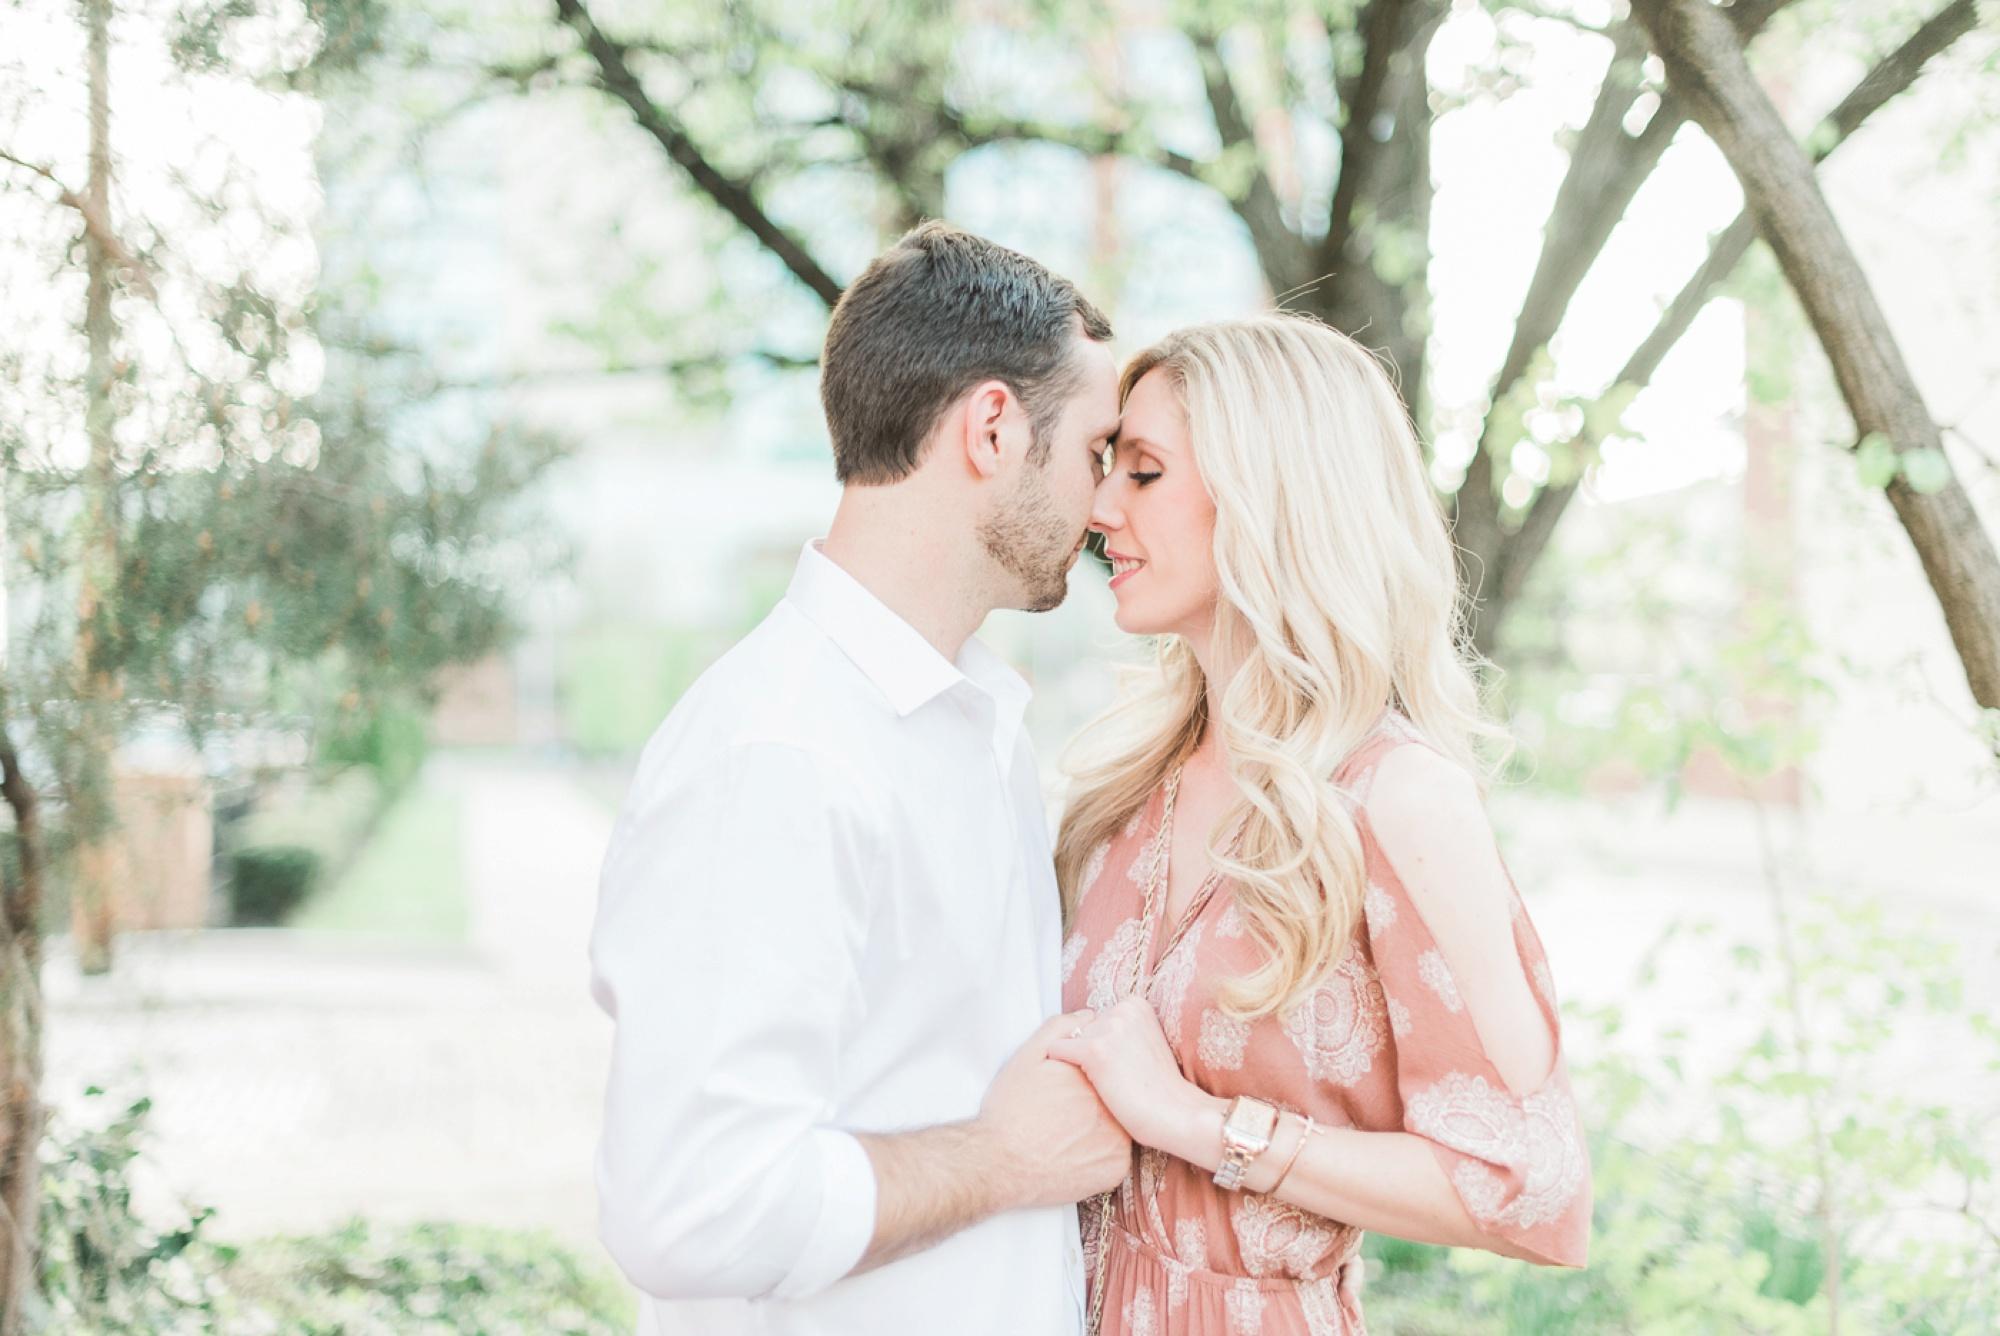 german-village-engagement-session-columbus-ohio-wedding-photographer-41.jpg